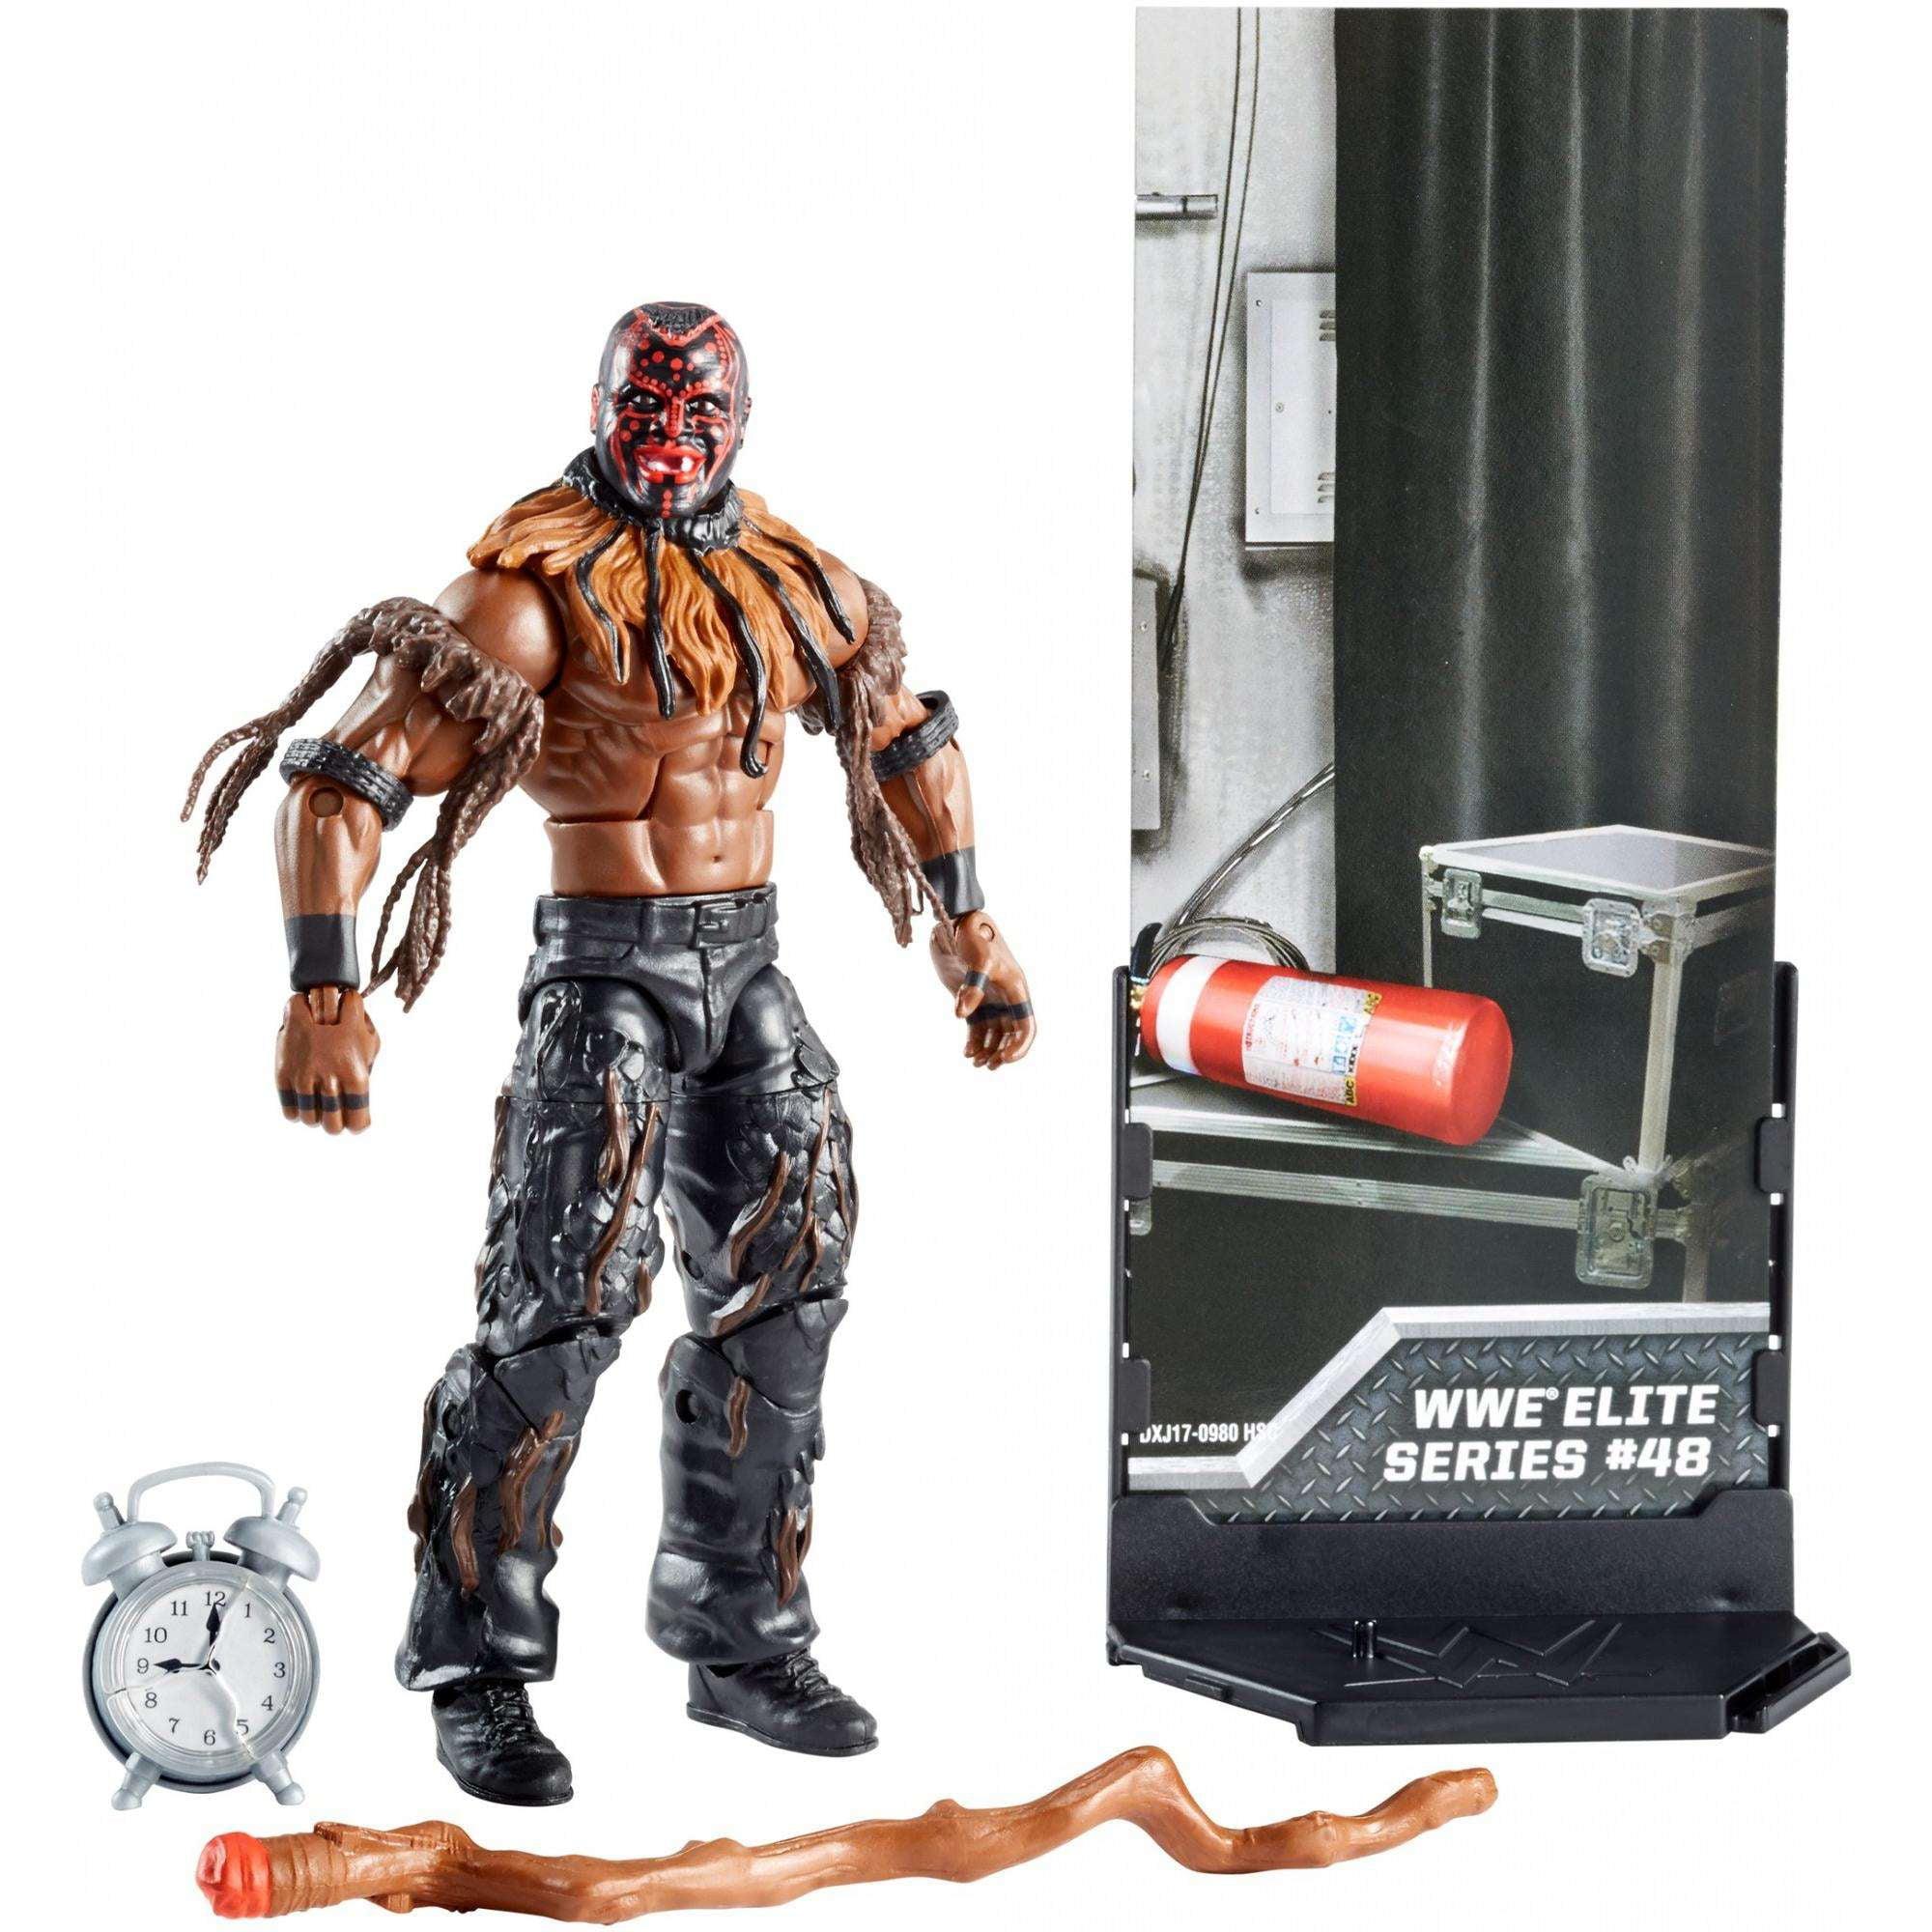 WWE Elite Collection Boogeyman Figure by Mattel